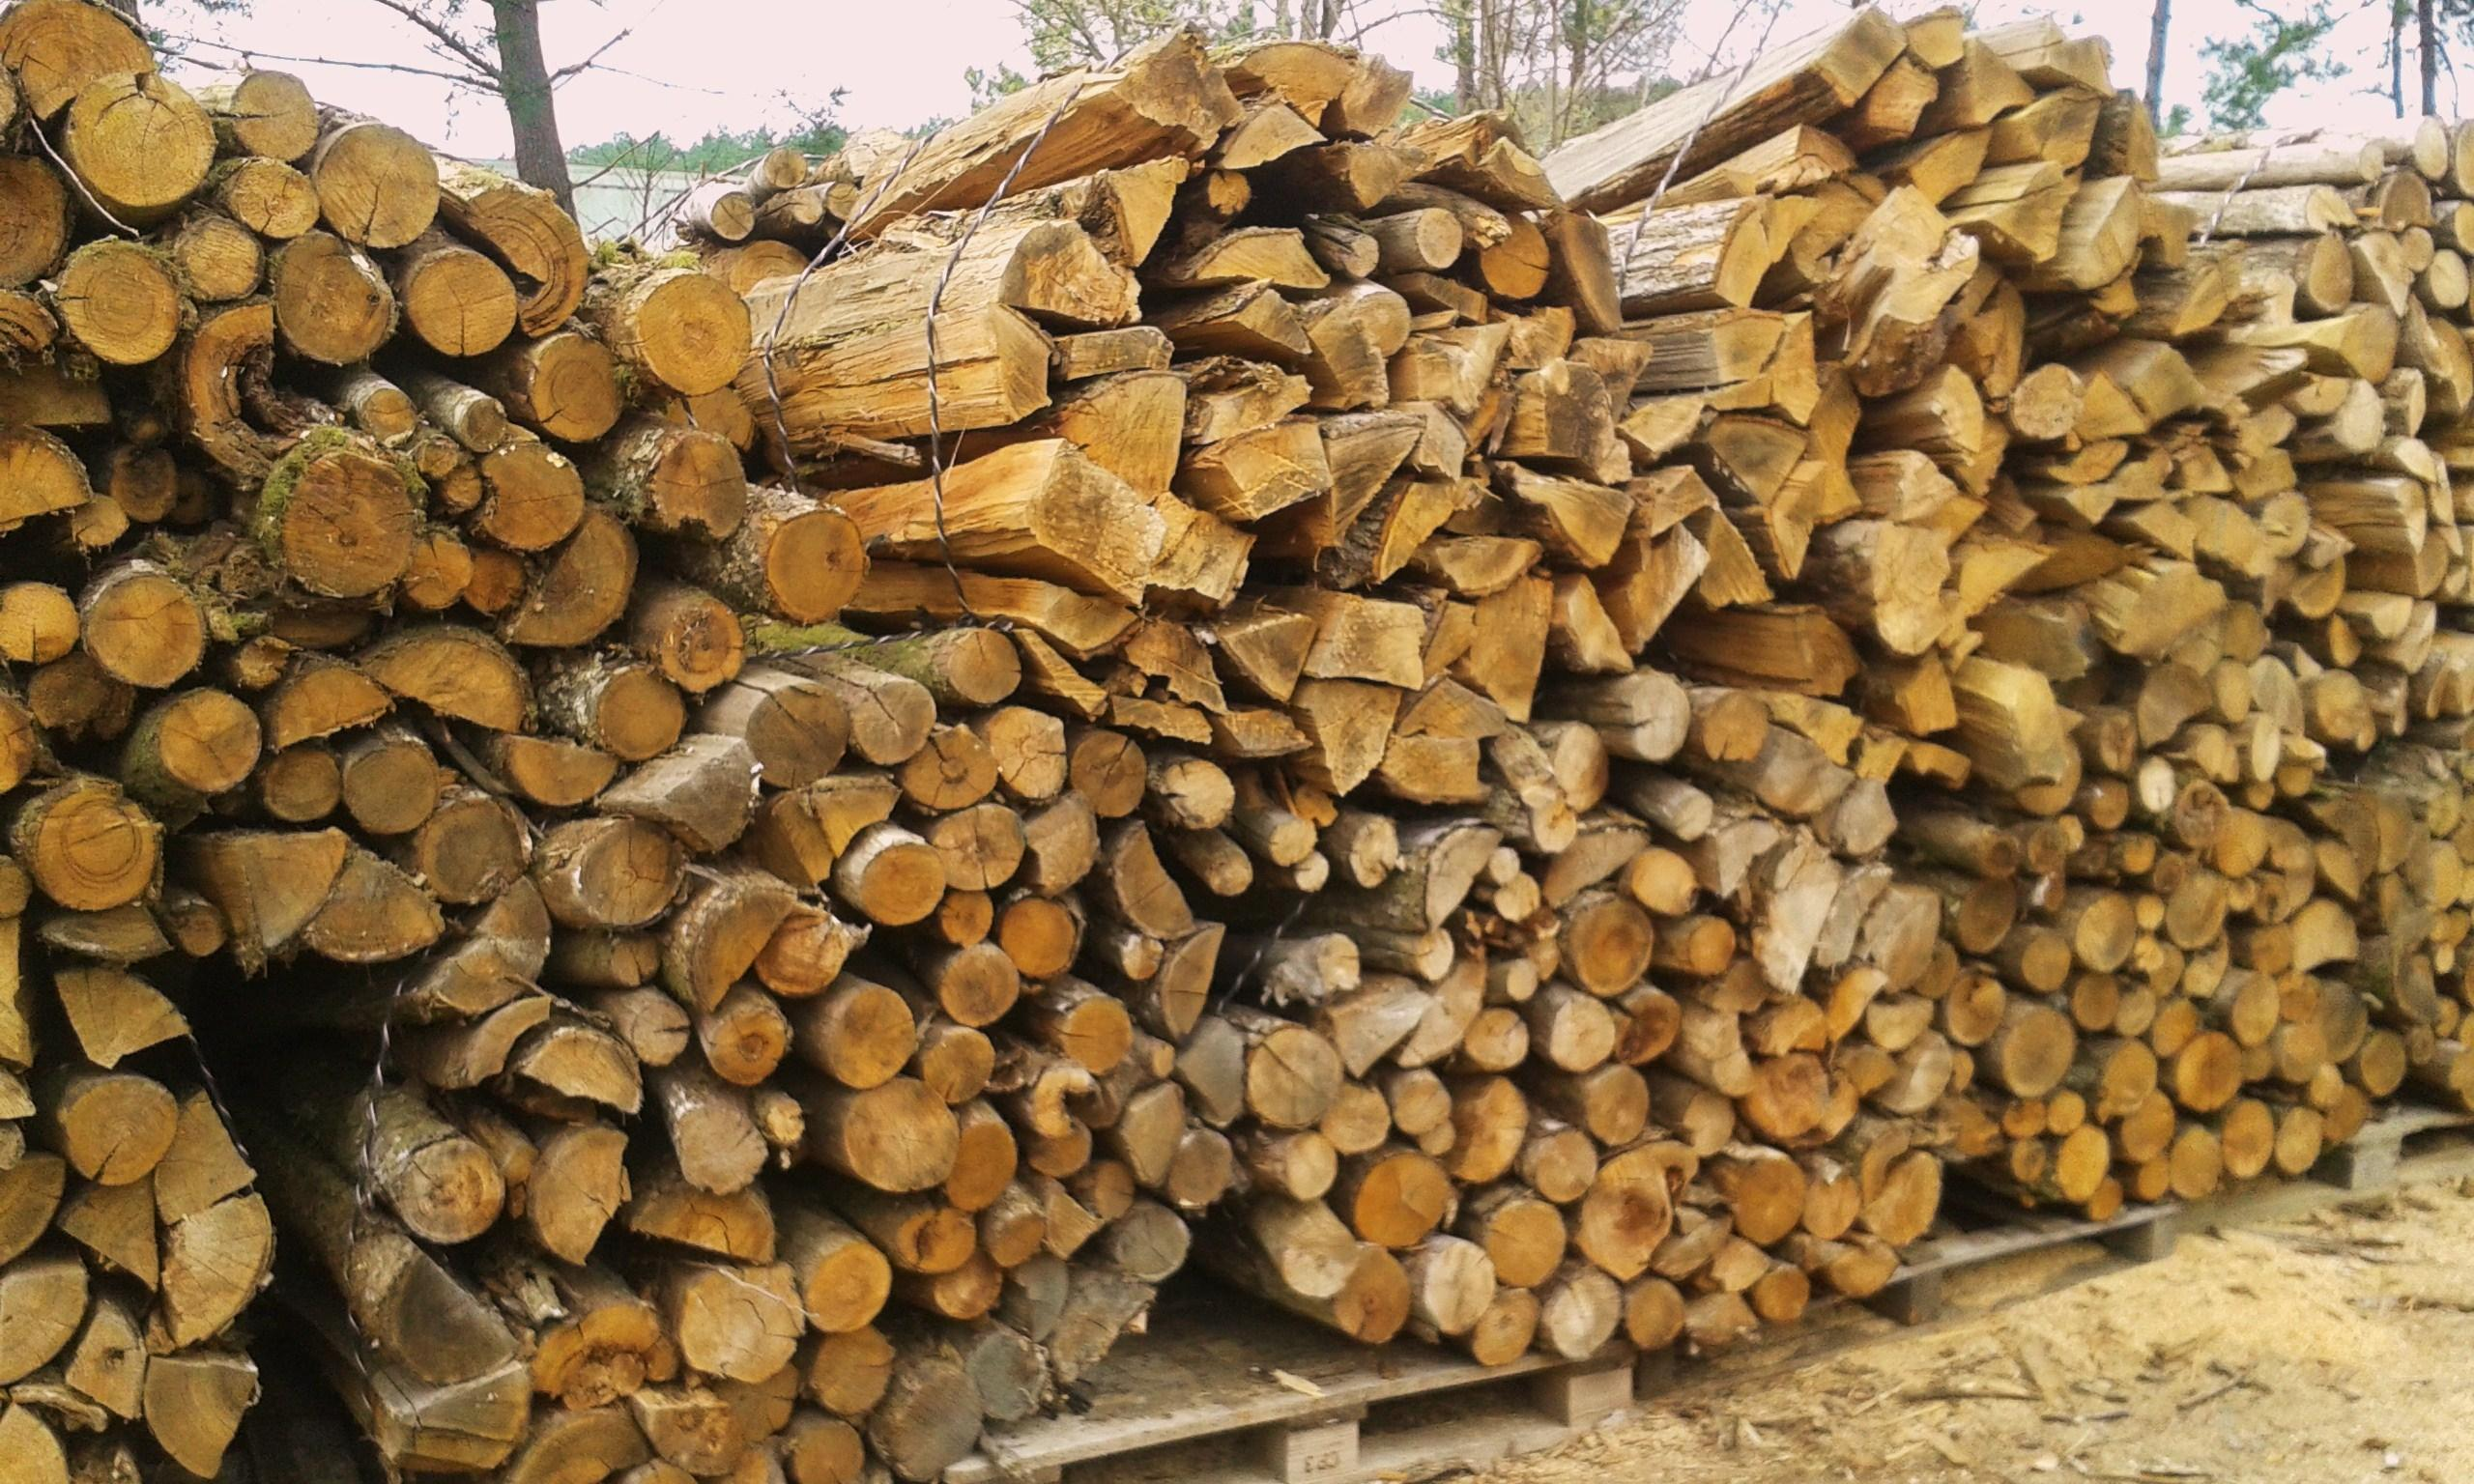 Acacia bois chauffage energies naturels - Acacia bois de chauffage ...